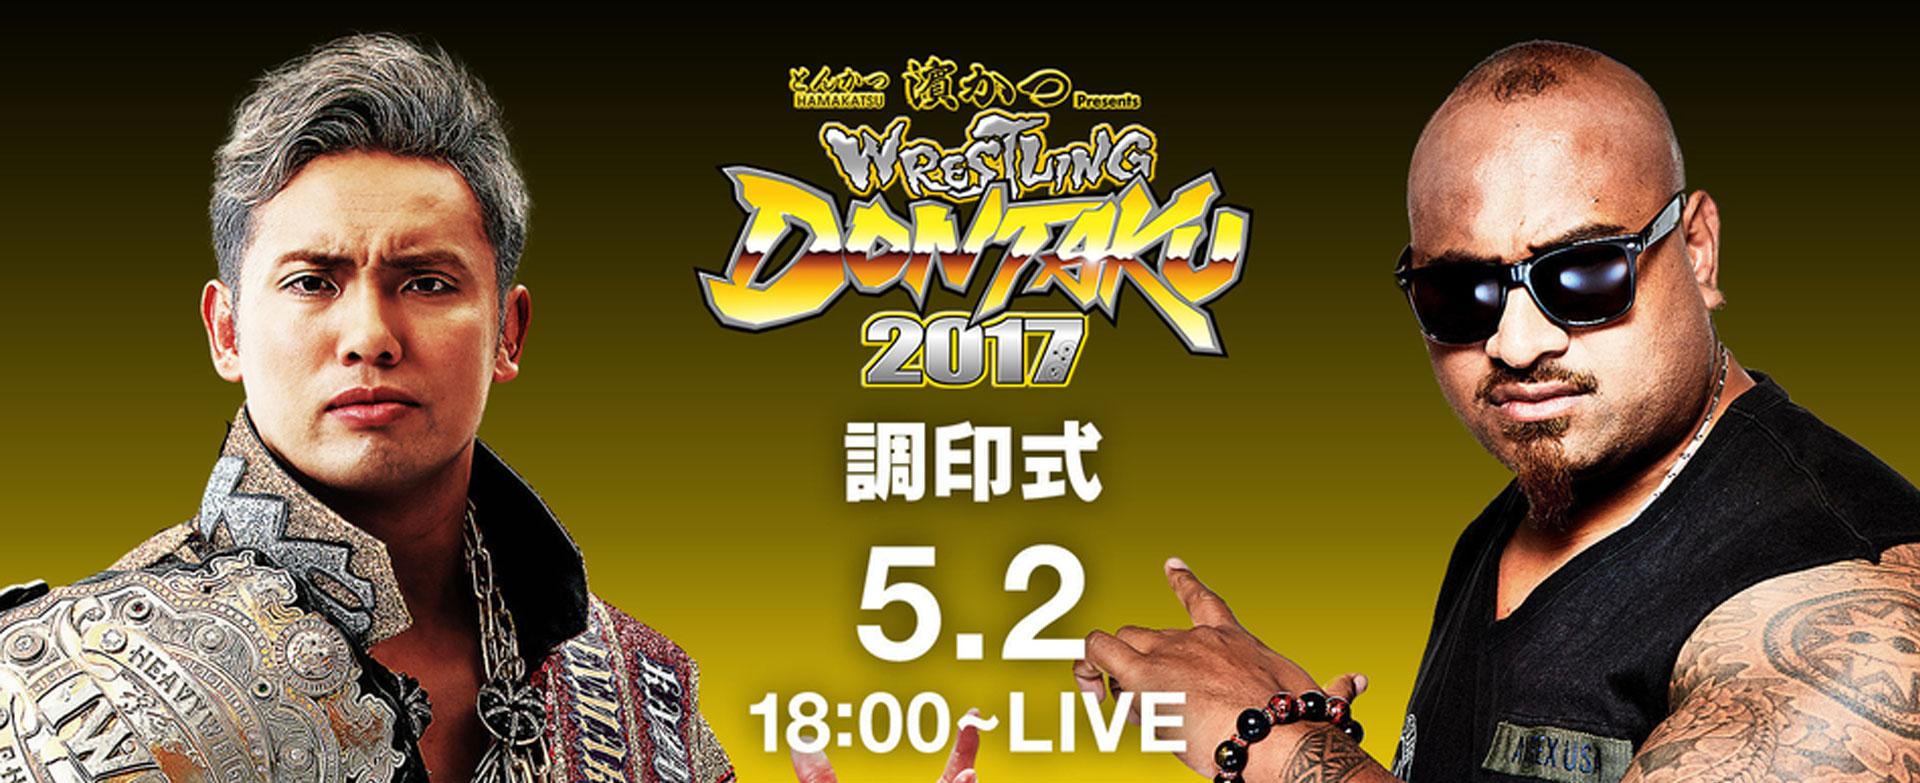 NJJPW Wrestling Dontaku